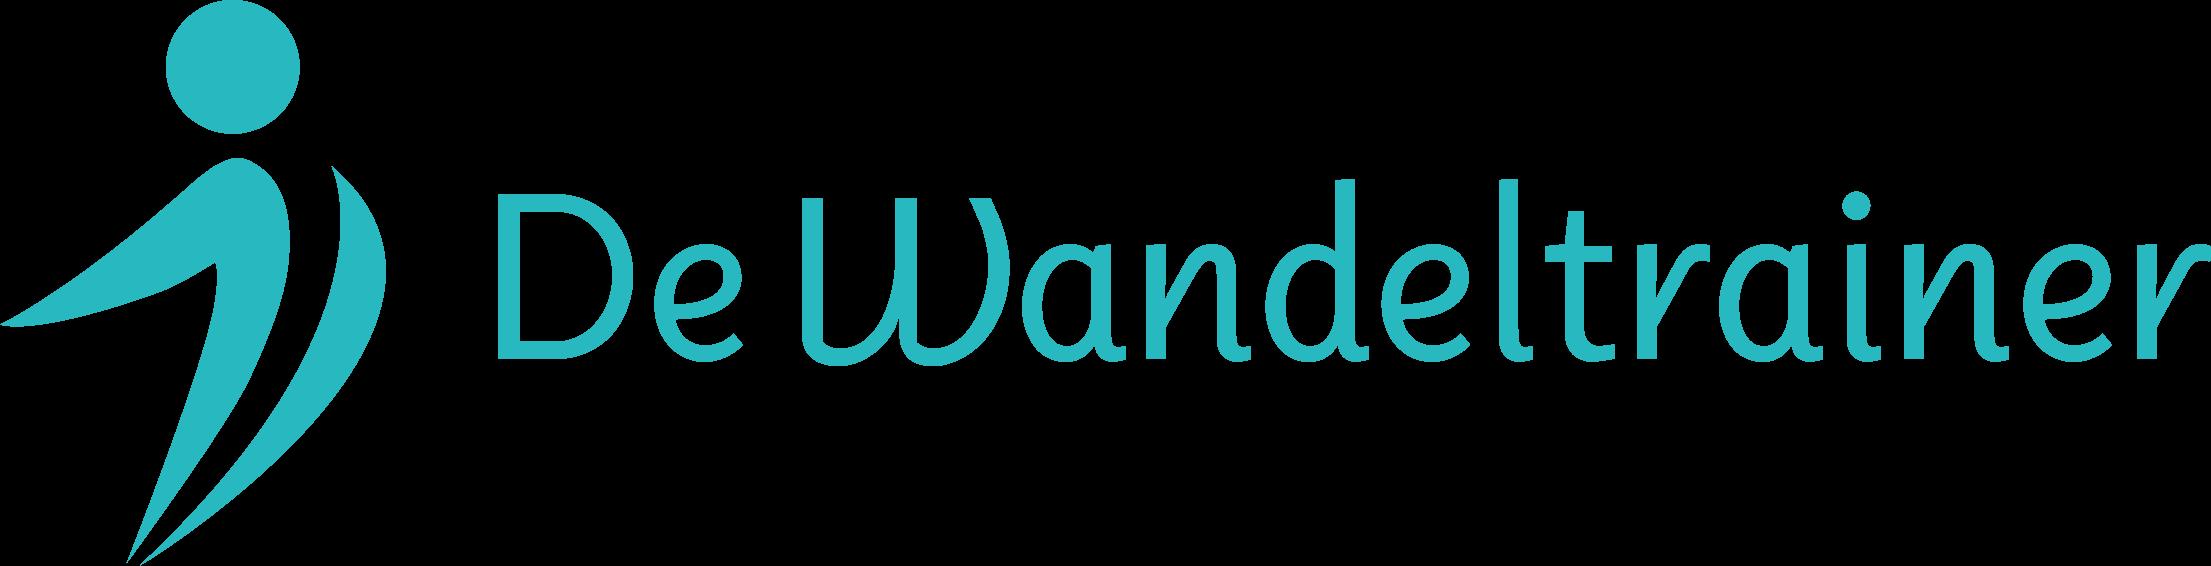 Wandeltraining